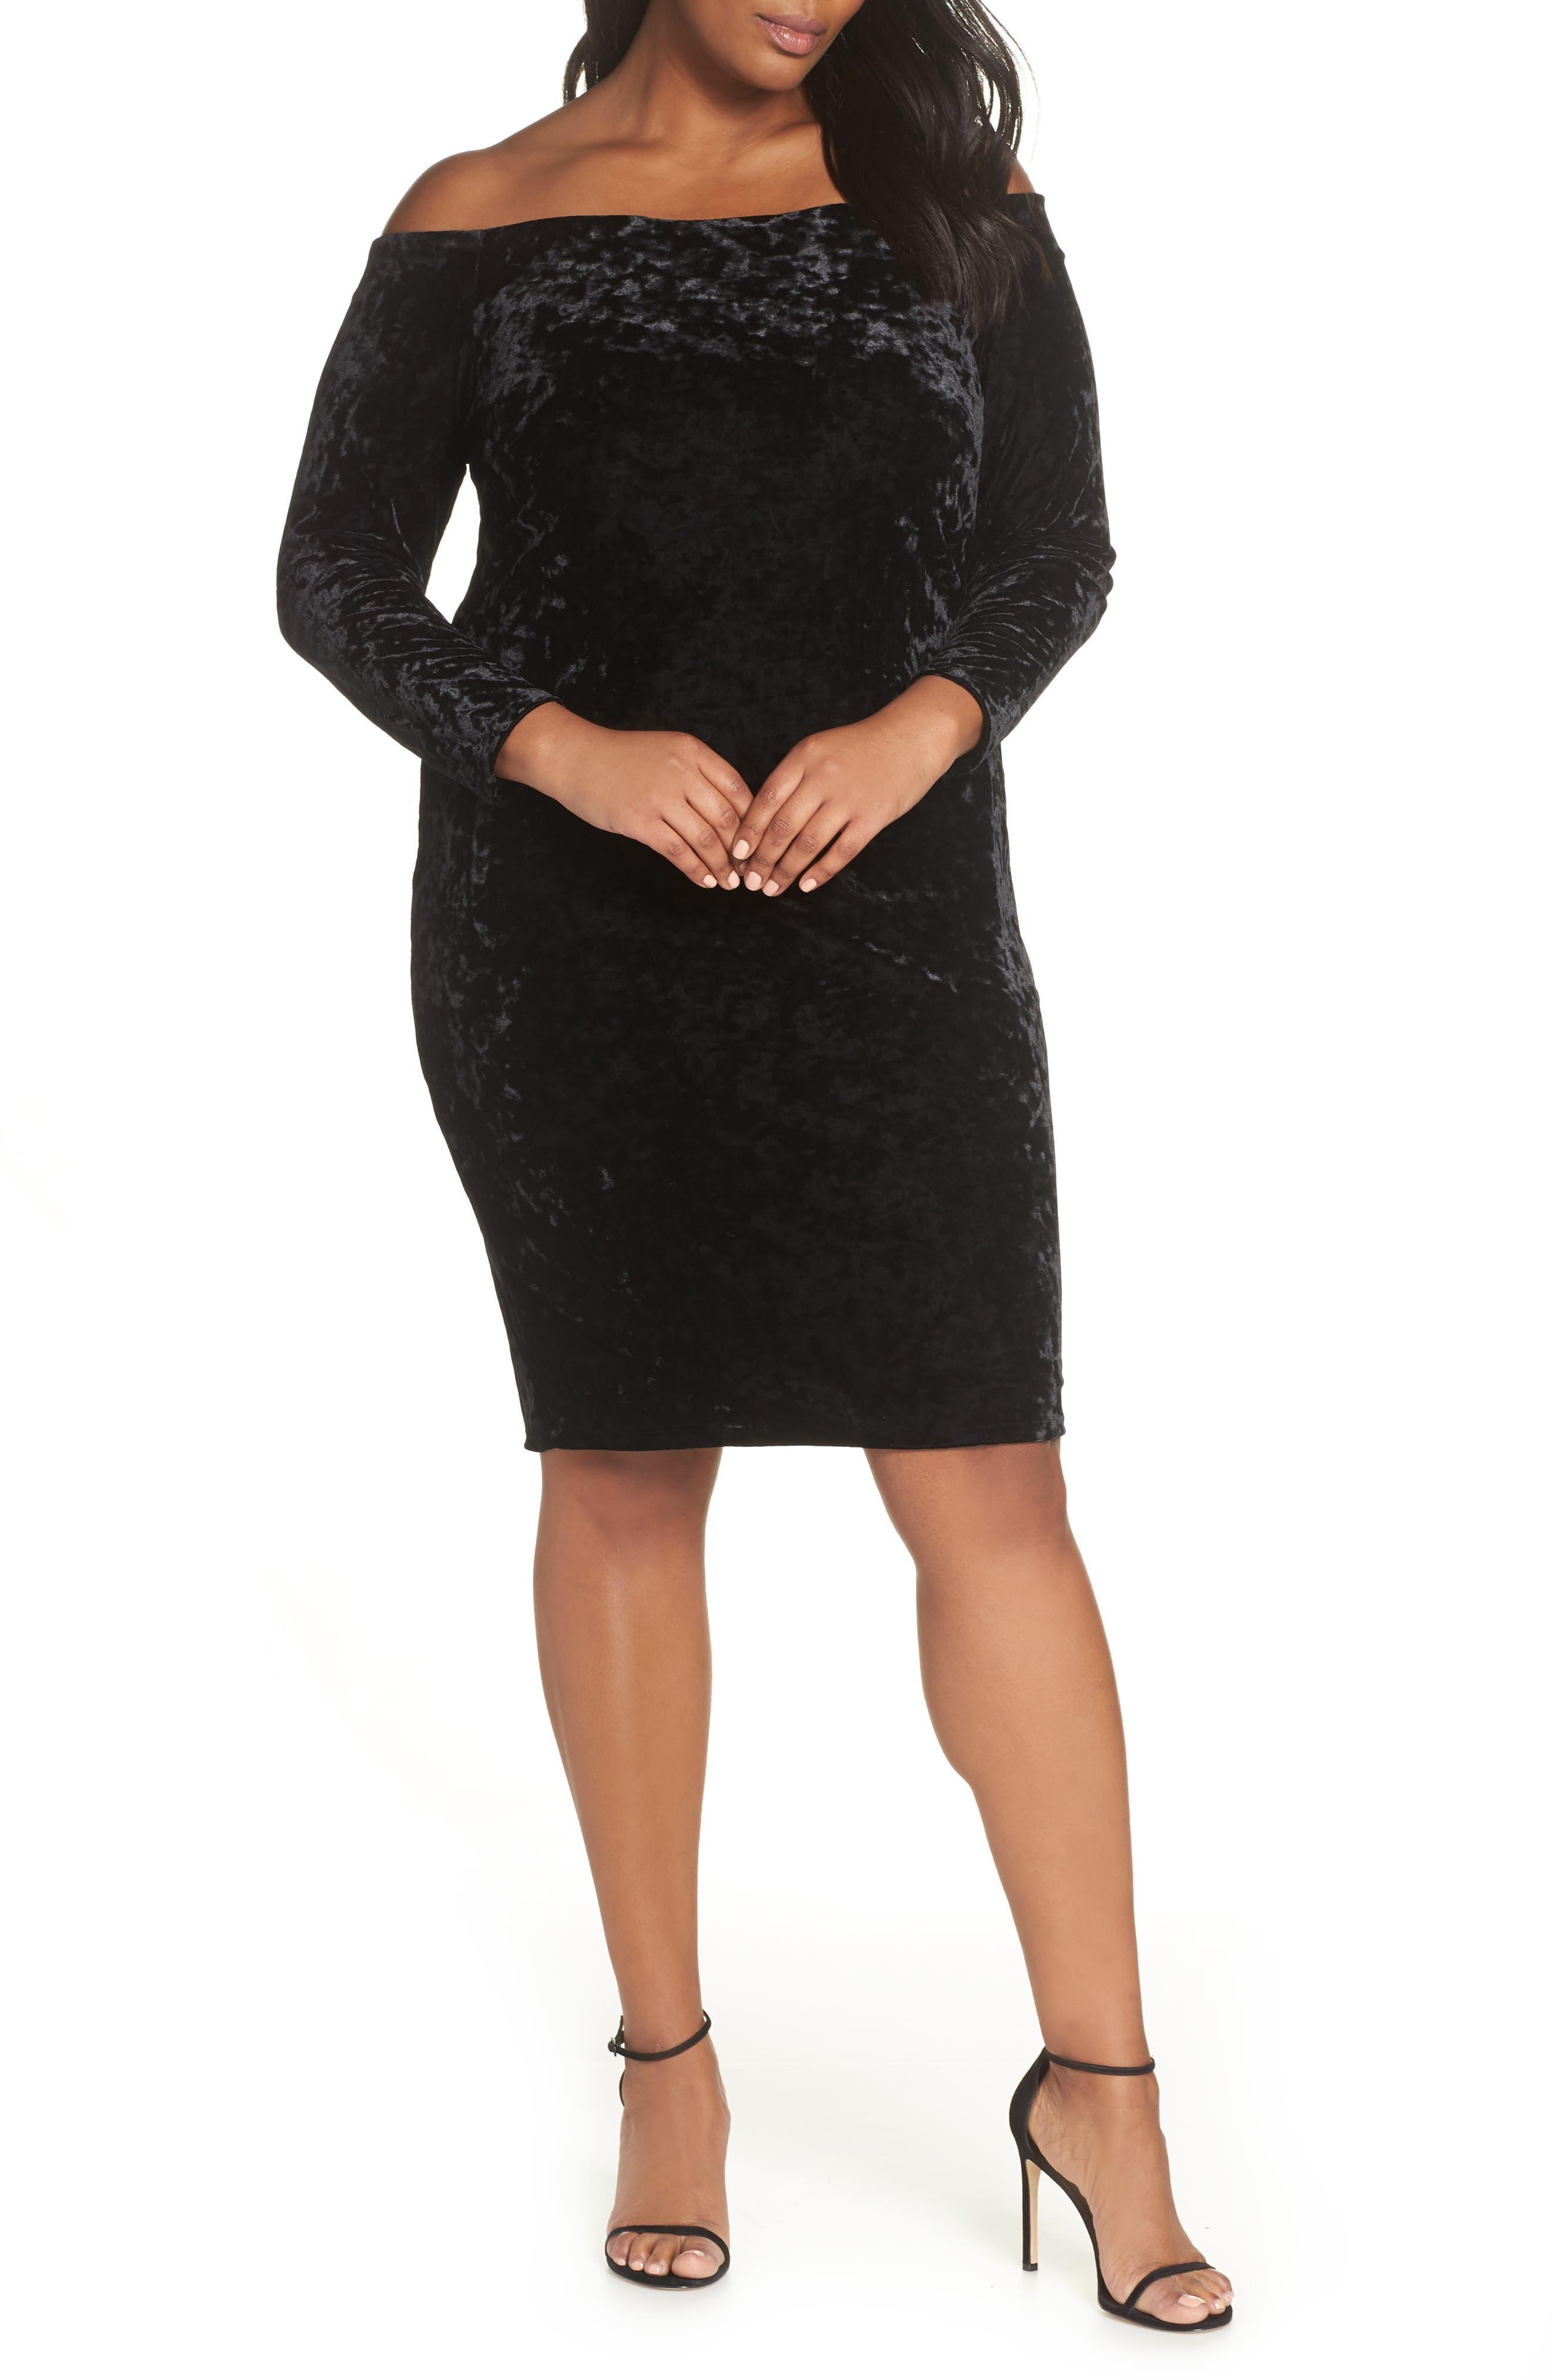 Glittering Black Plus Size Dresses Cocktail Party